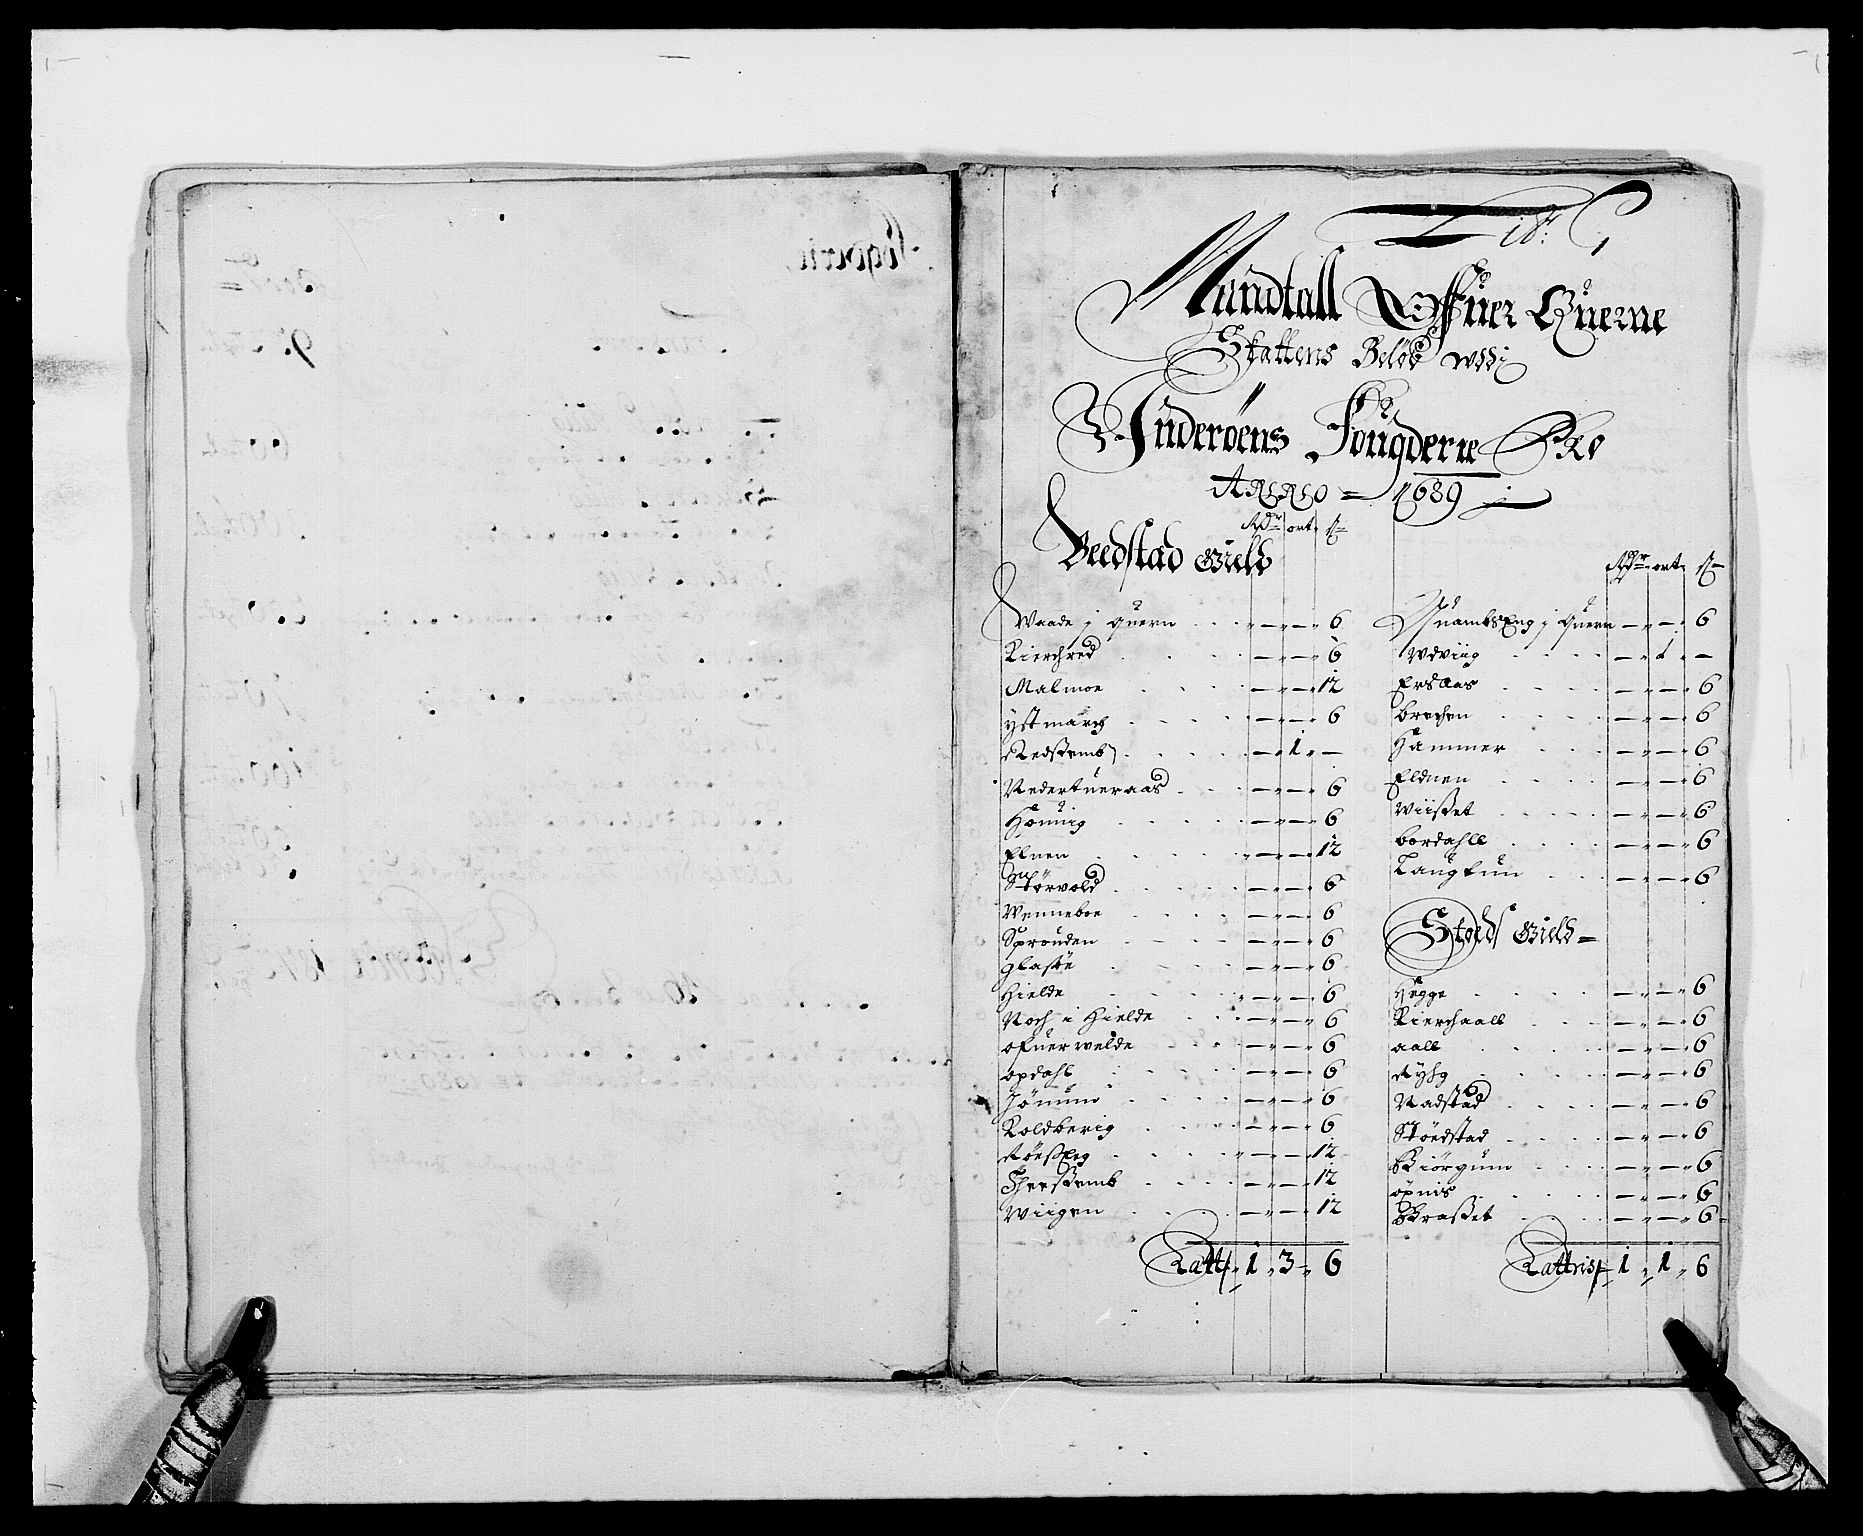 RA, Rentekammeret inntil 1814, Reviderte regnskaper, Fogderegnskap, R63/L4306: Fogderegnskap Inderøy, 1687-1689, s. 401